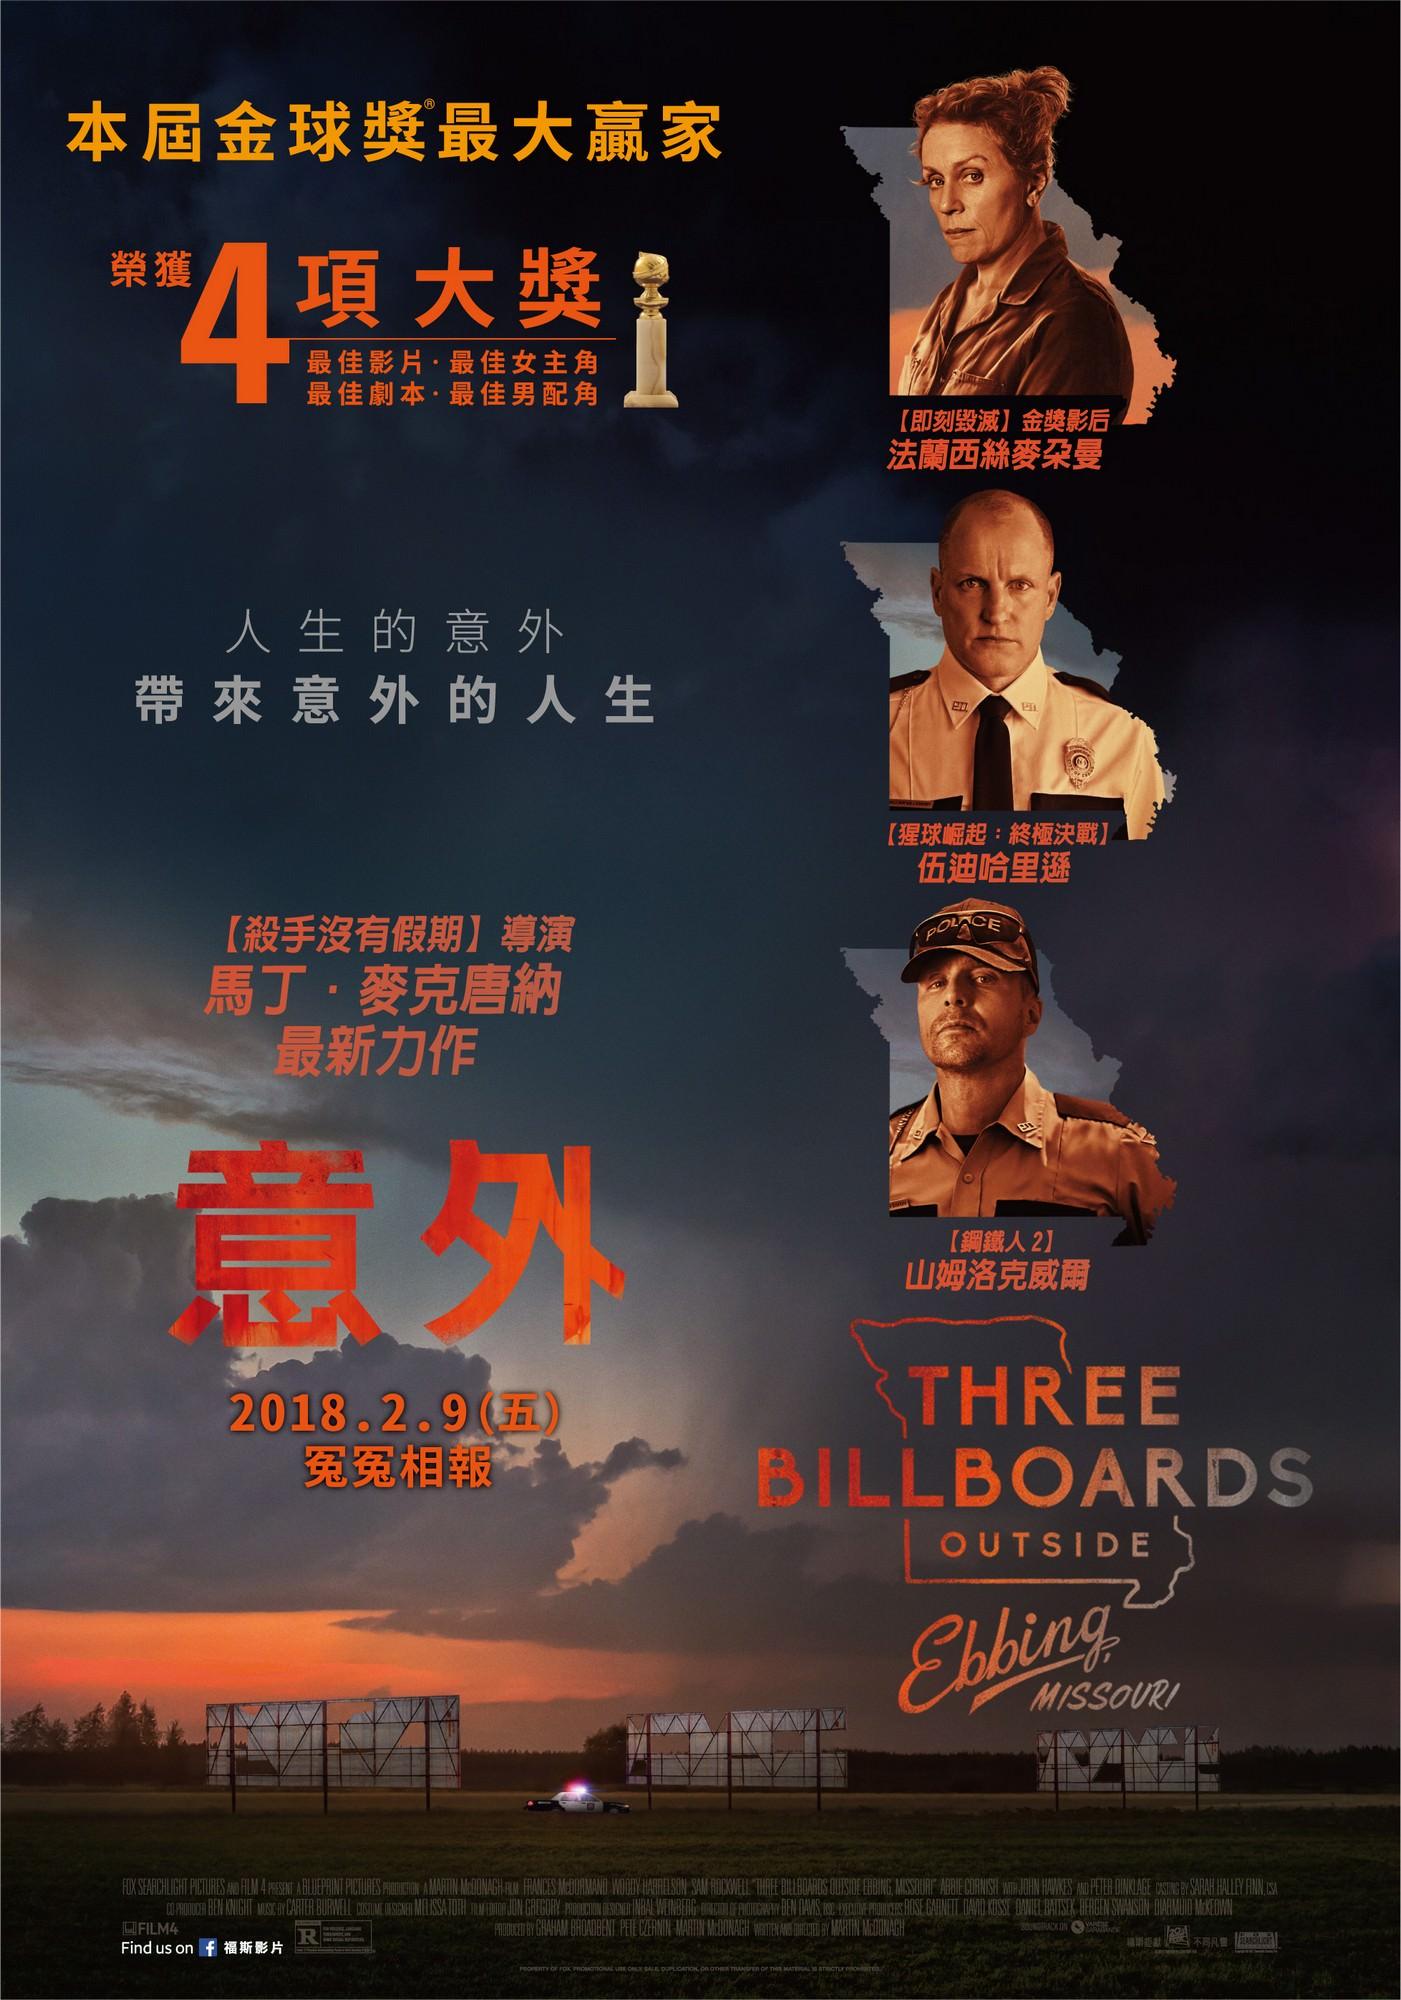 Movie, Three Billboards Outside Ebbing, Missouri(美國.英國) / 意外(台) / 廣告牌殺人事件(港) / 三块广告牌(網), 電影海報, 台灣